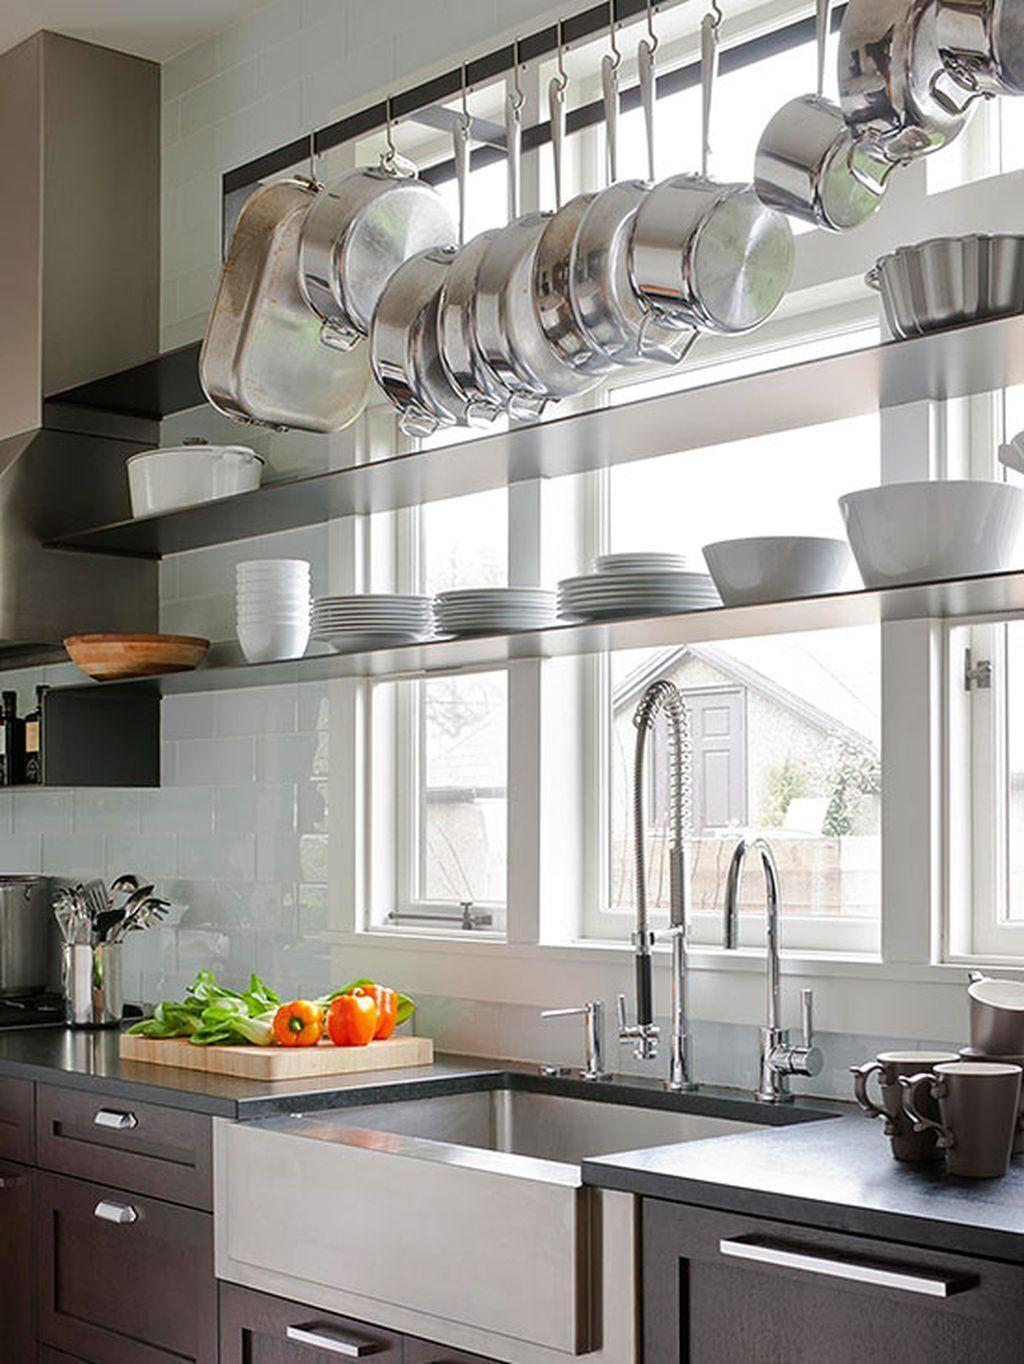 Pin by sm tracy on tiny kitchen pinterest kitchen kitchen